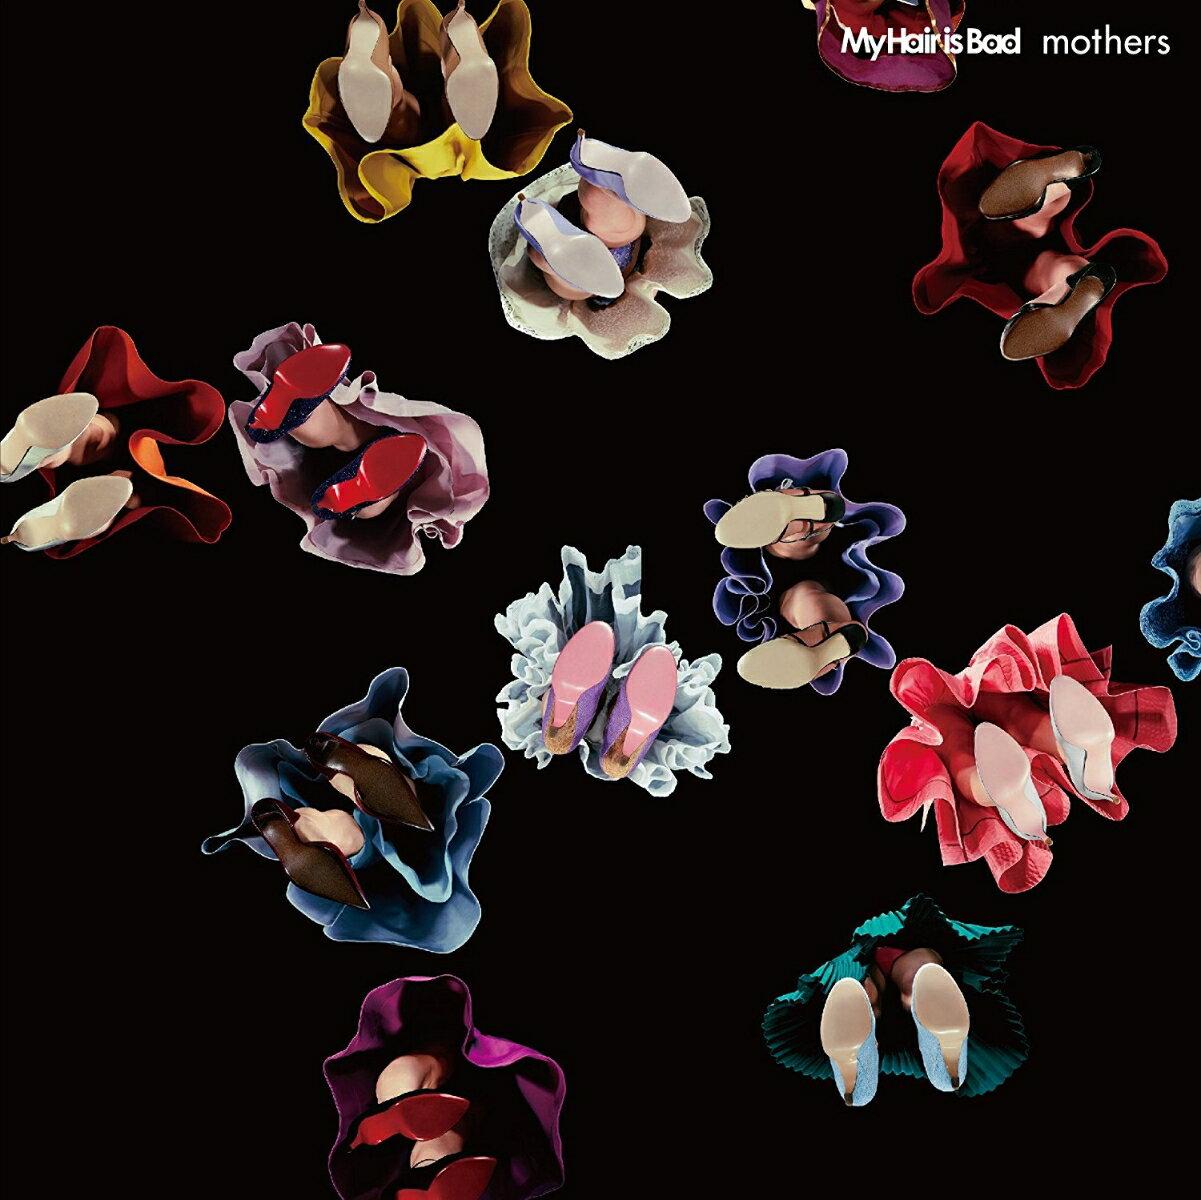 mothers (初回限定盤 CD+DVD) [ My Hair is Bad ]